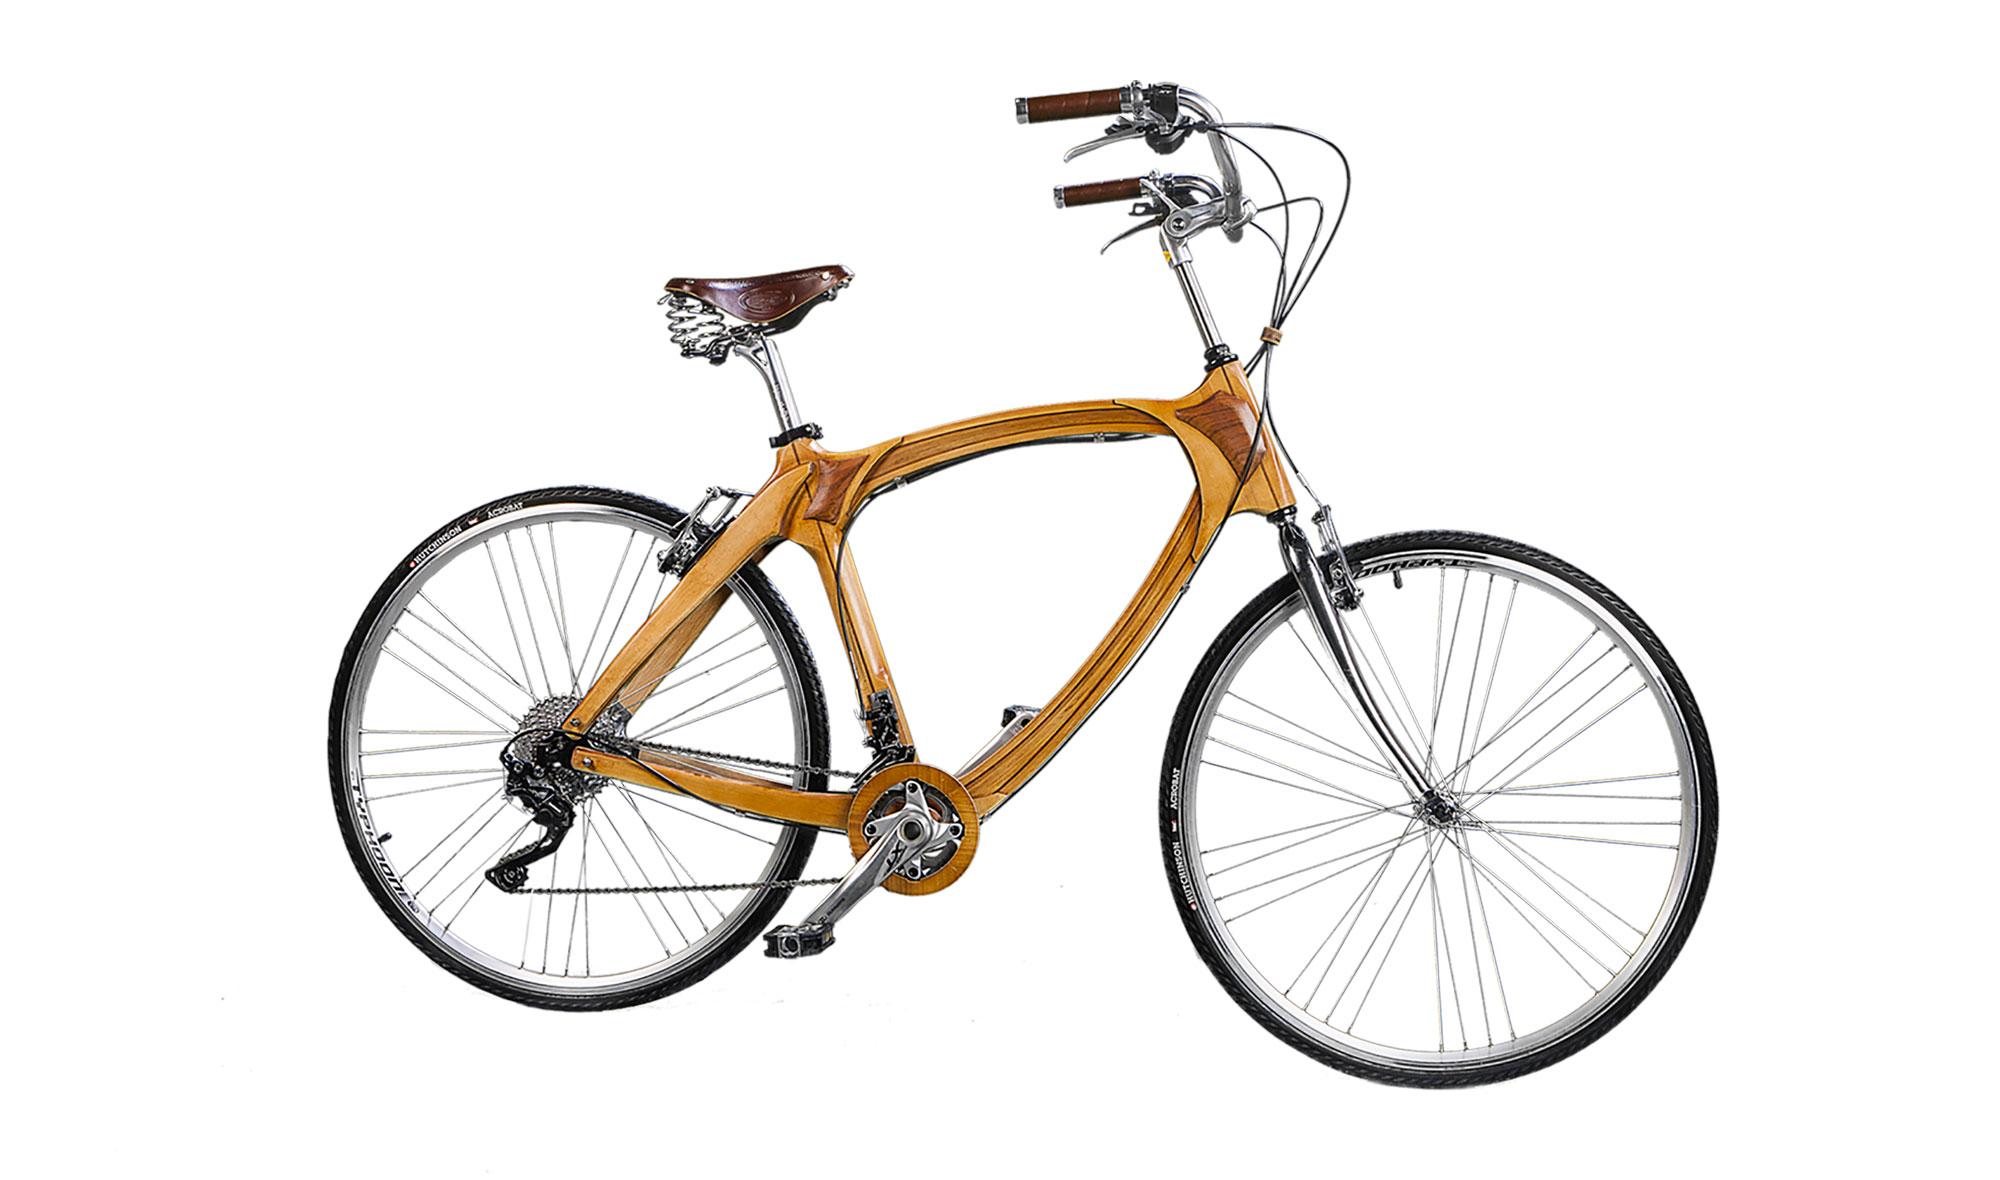 Bicicleta De Madera Vintage Amsterdam En Portobellostreet Es # Muebles Bicicleta